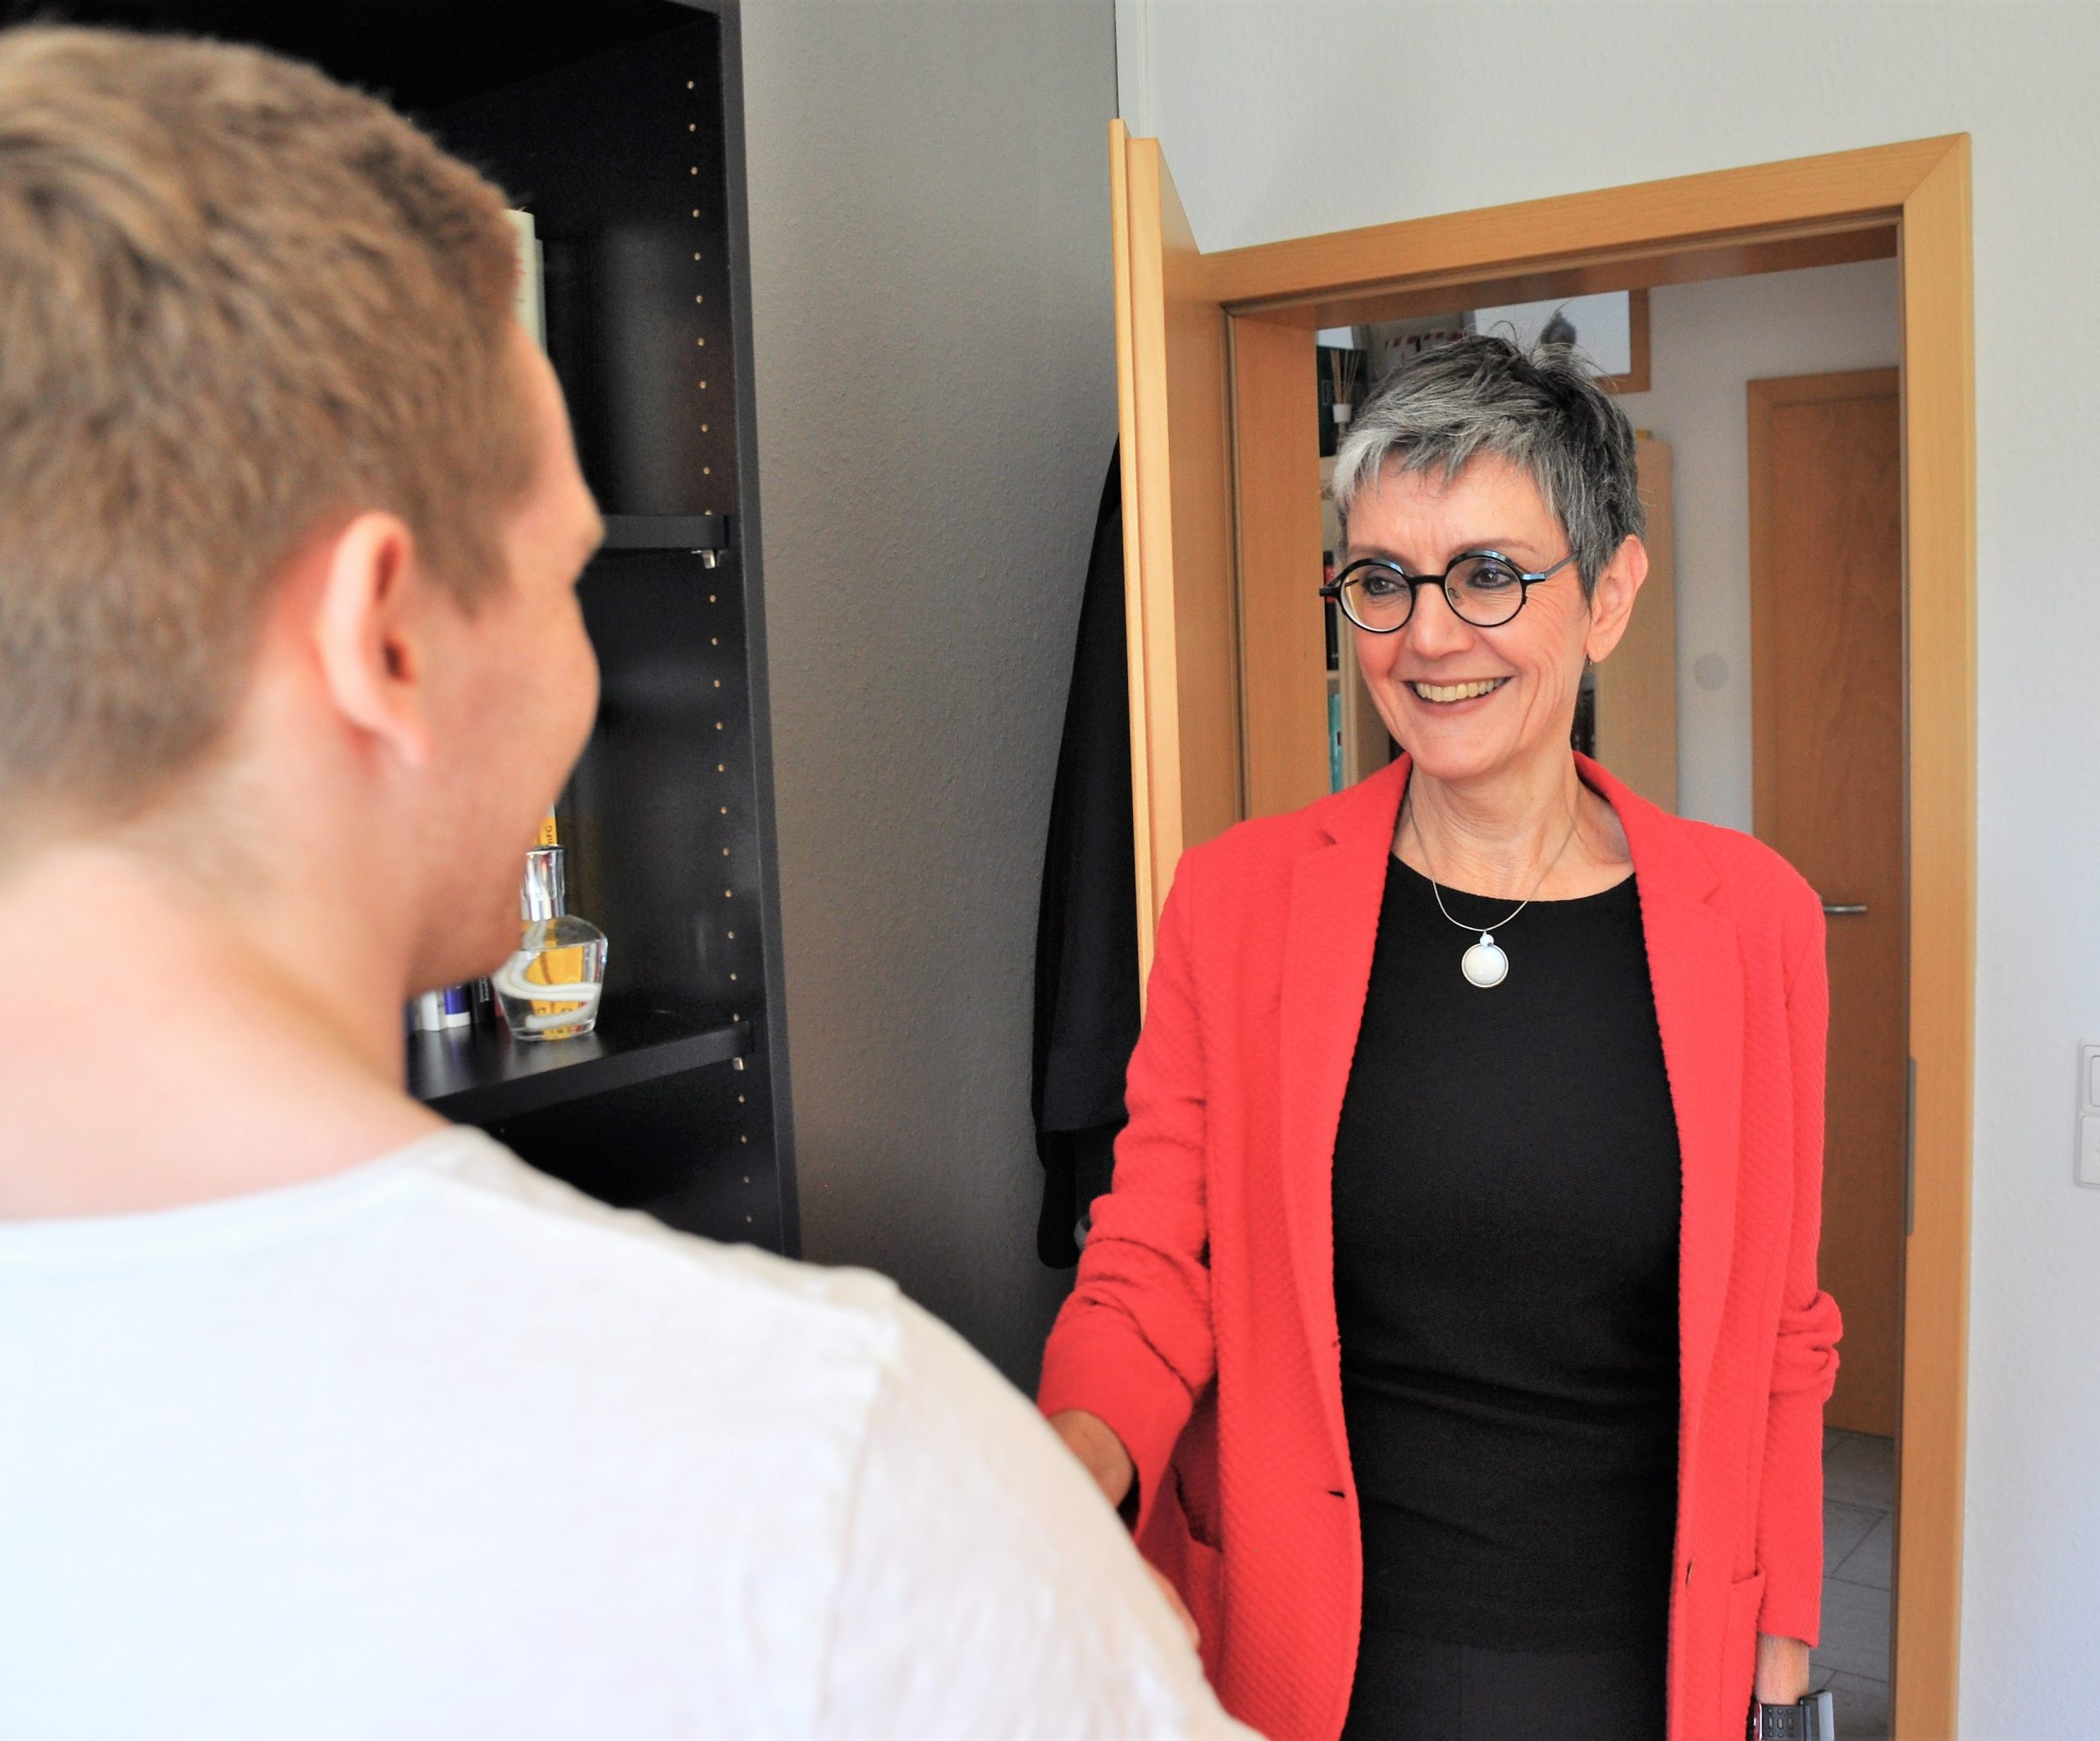 Anwältin Wagensonner Rechtsanwaltskanzlei Egger-Büssing Leistungen